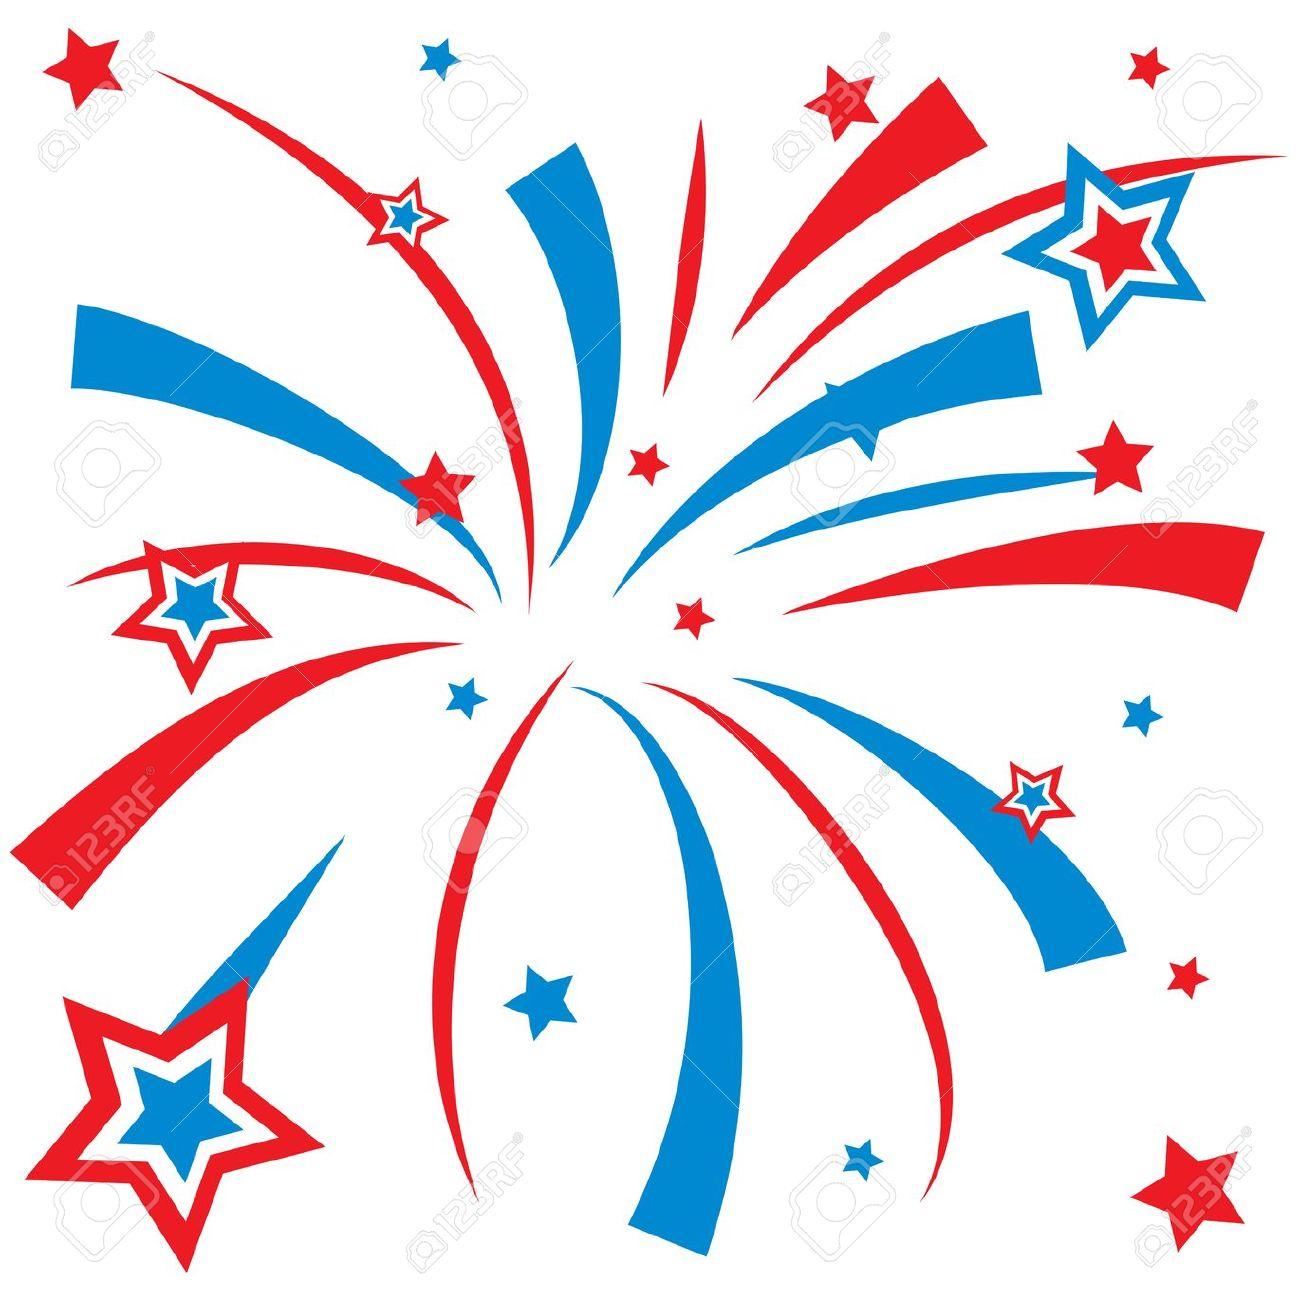 Fireworks Clipart #6734-Fireworks Clipart #6734-9